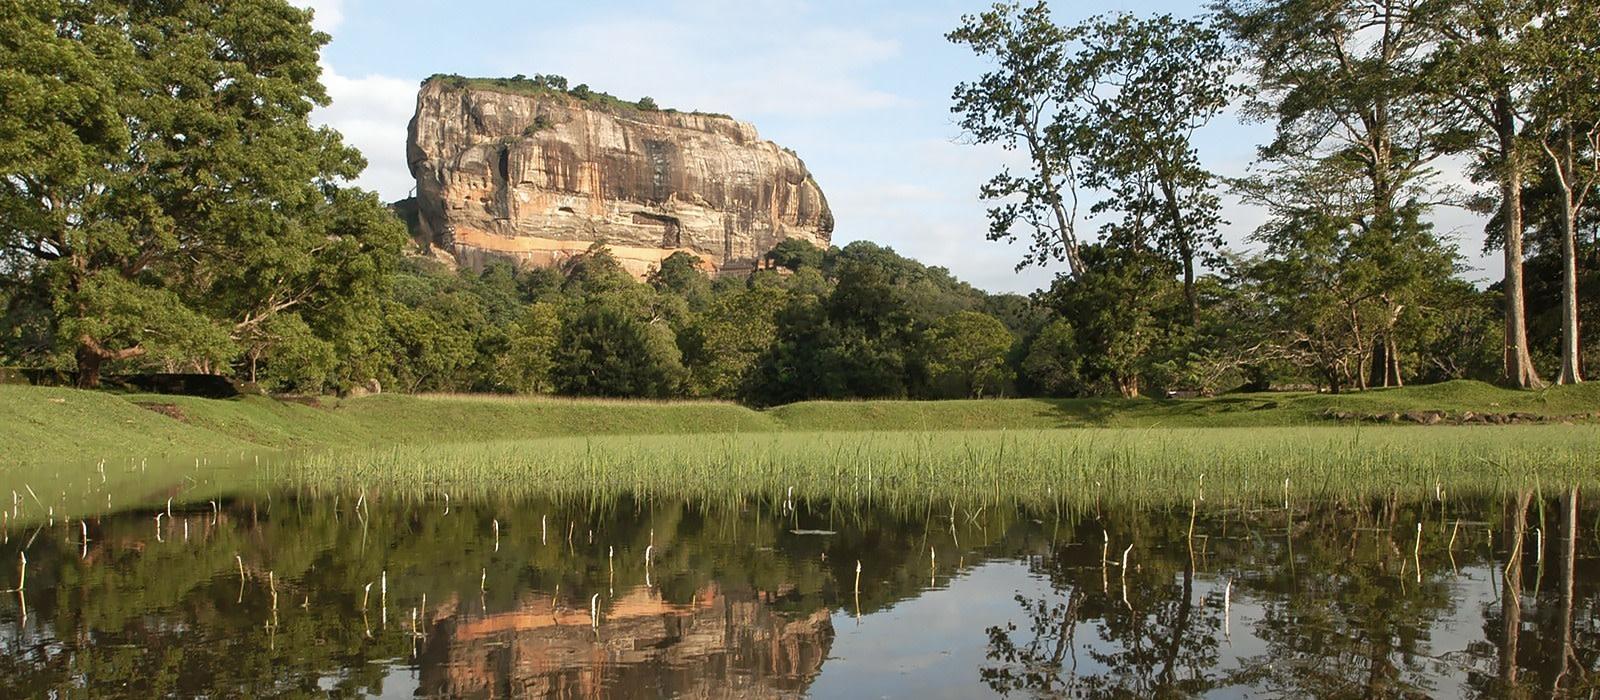 Reise nach Sri Lanka: Traumland & Ayurveda Paradies Urlaub 1